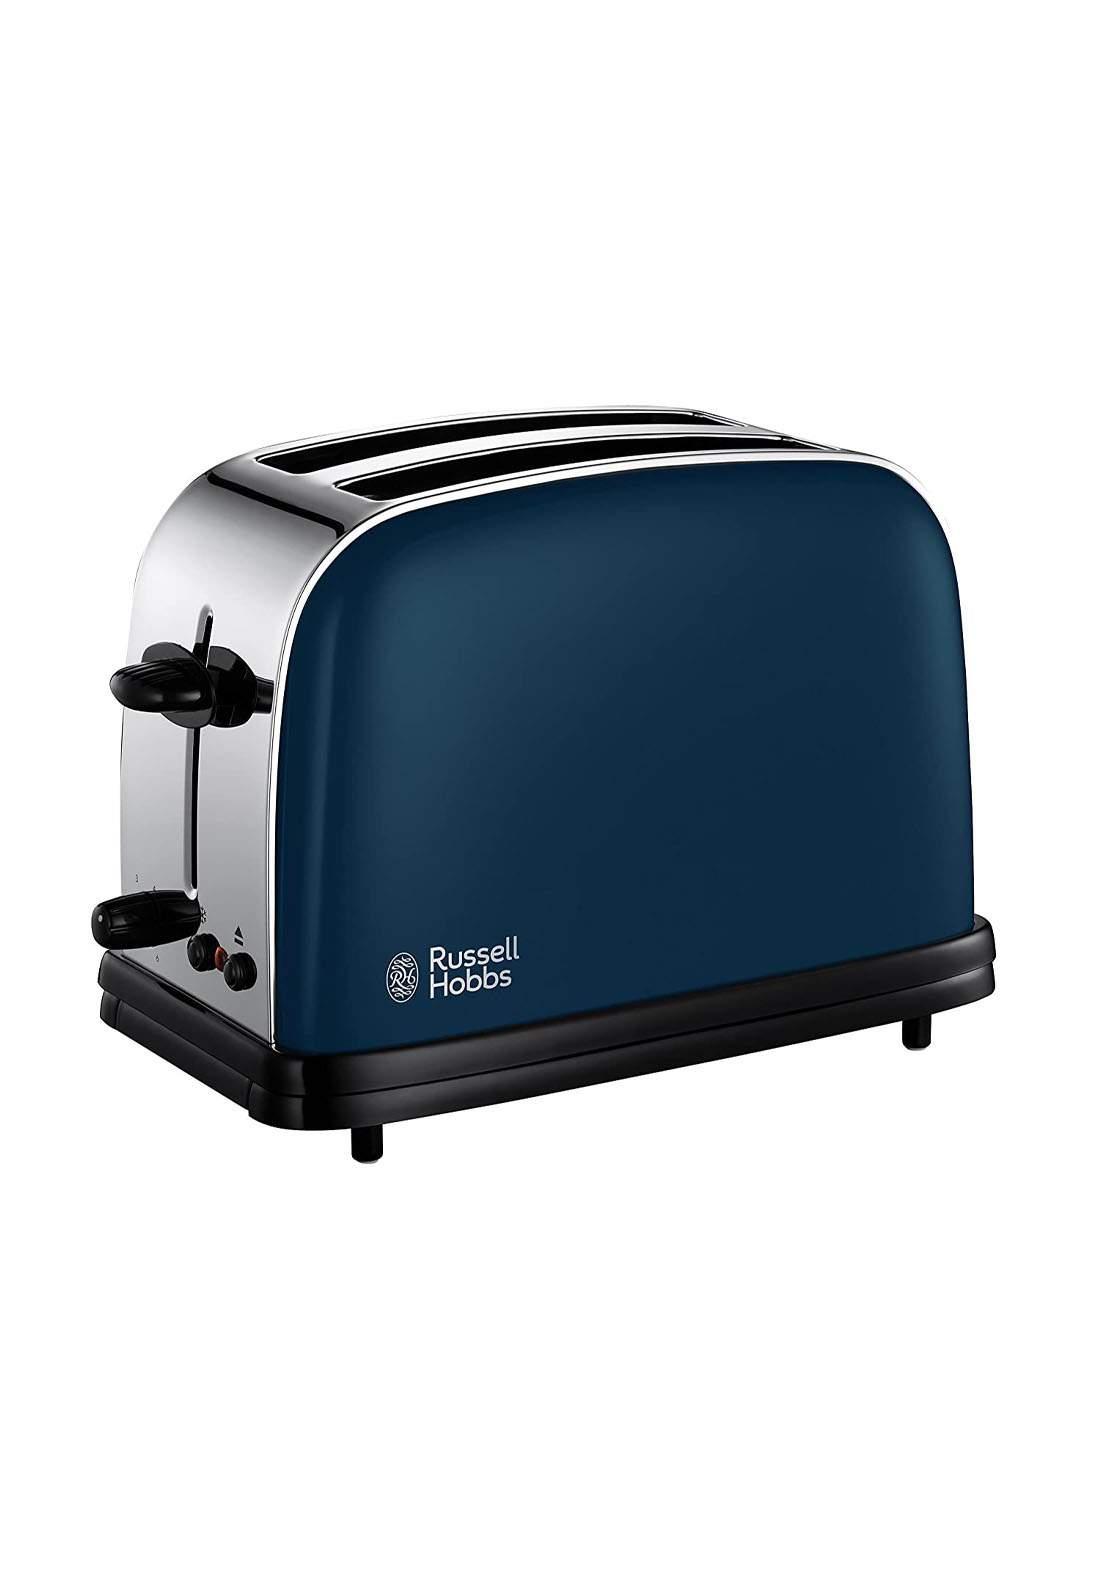 Russell hobbs 18958  Toaster blue  تويستر